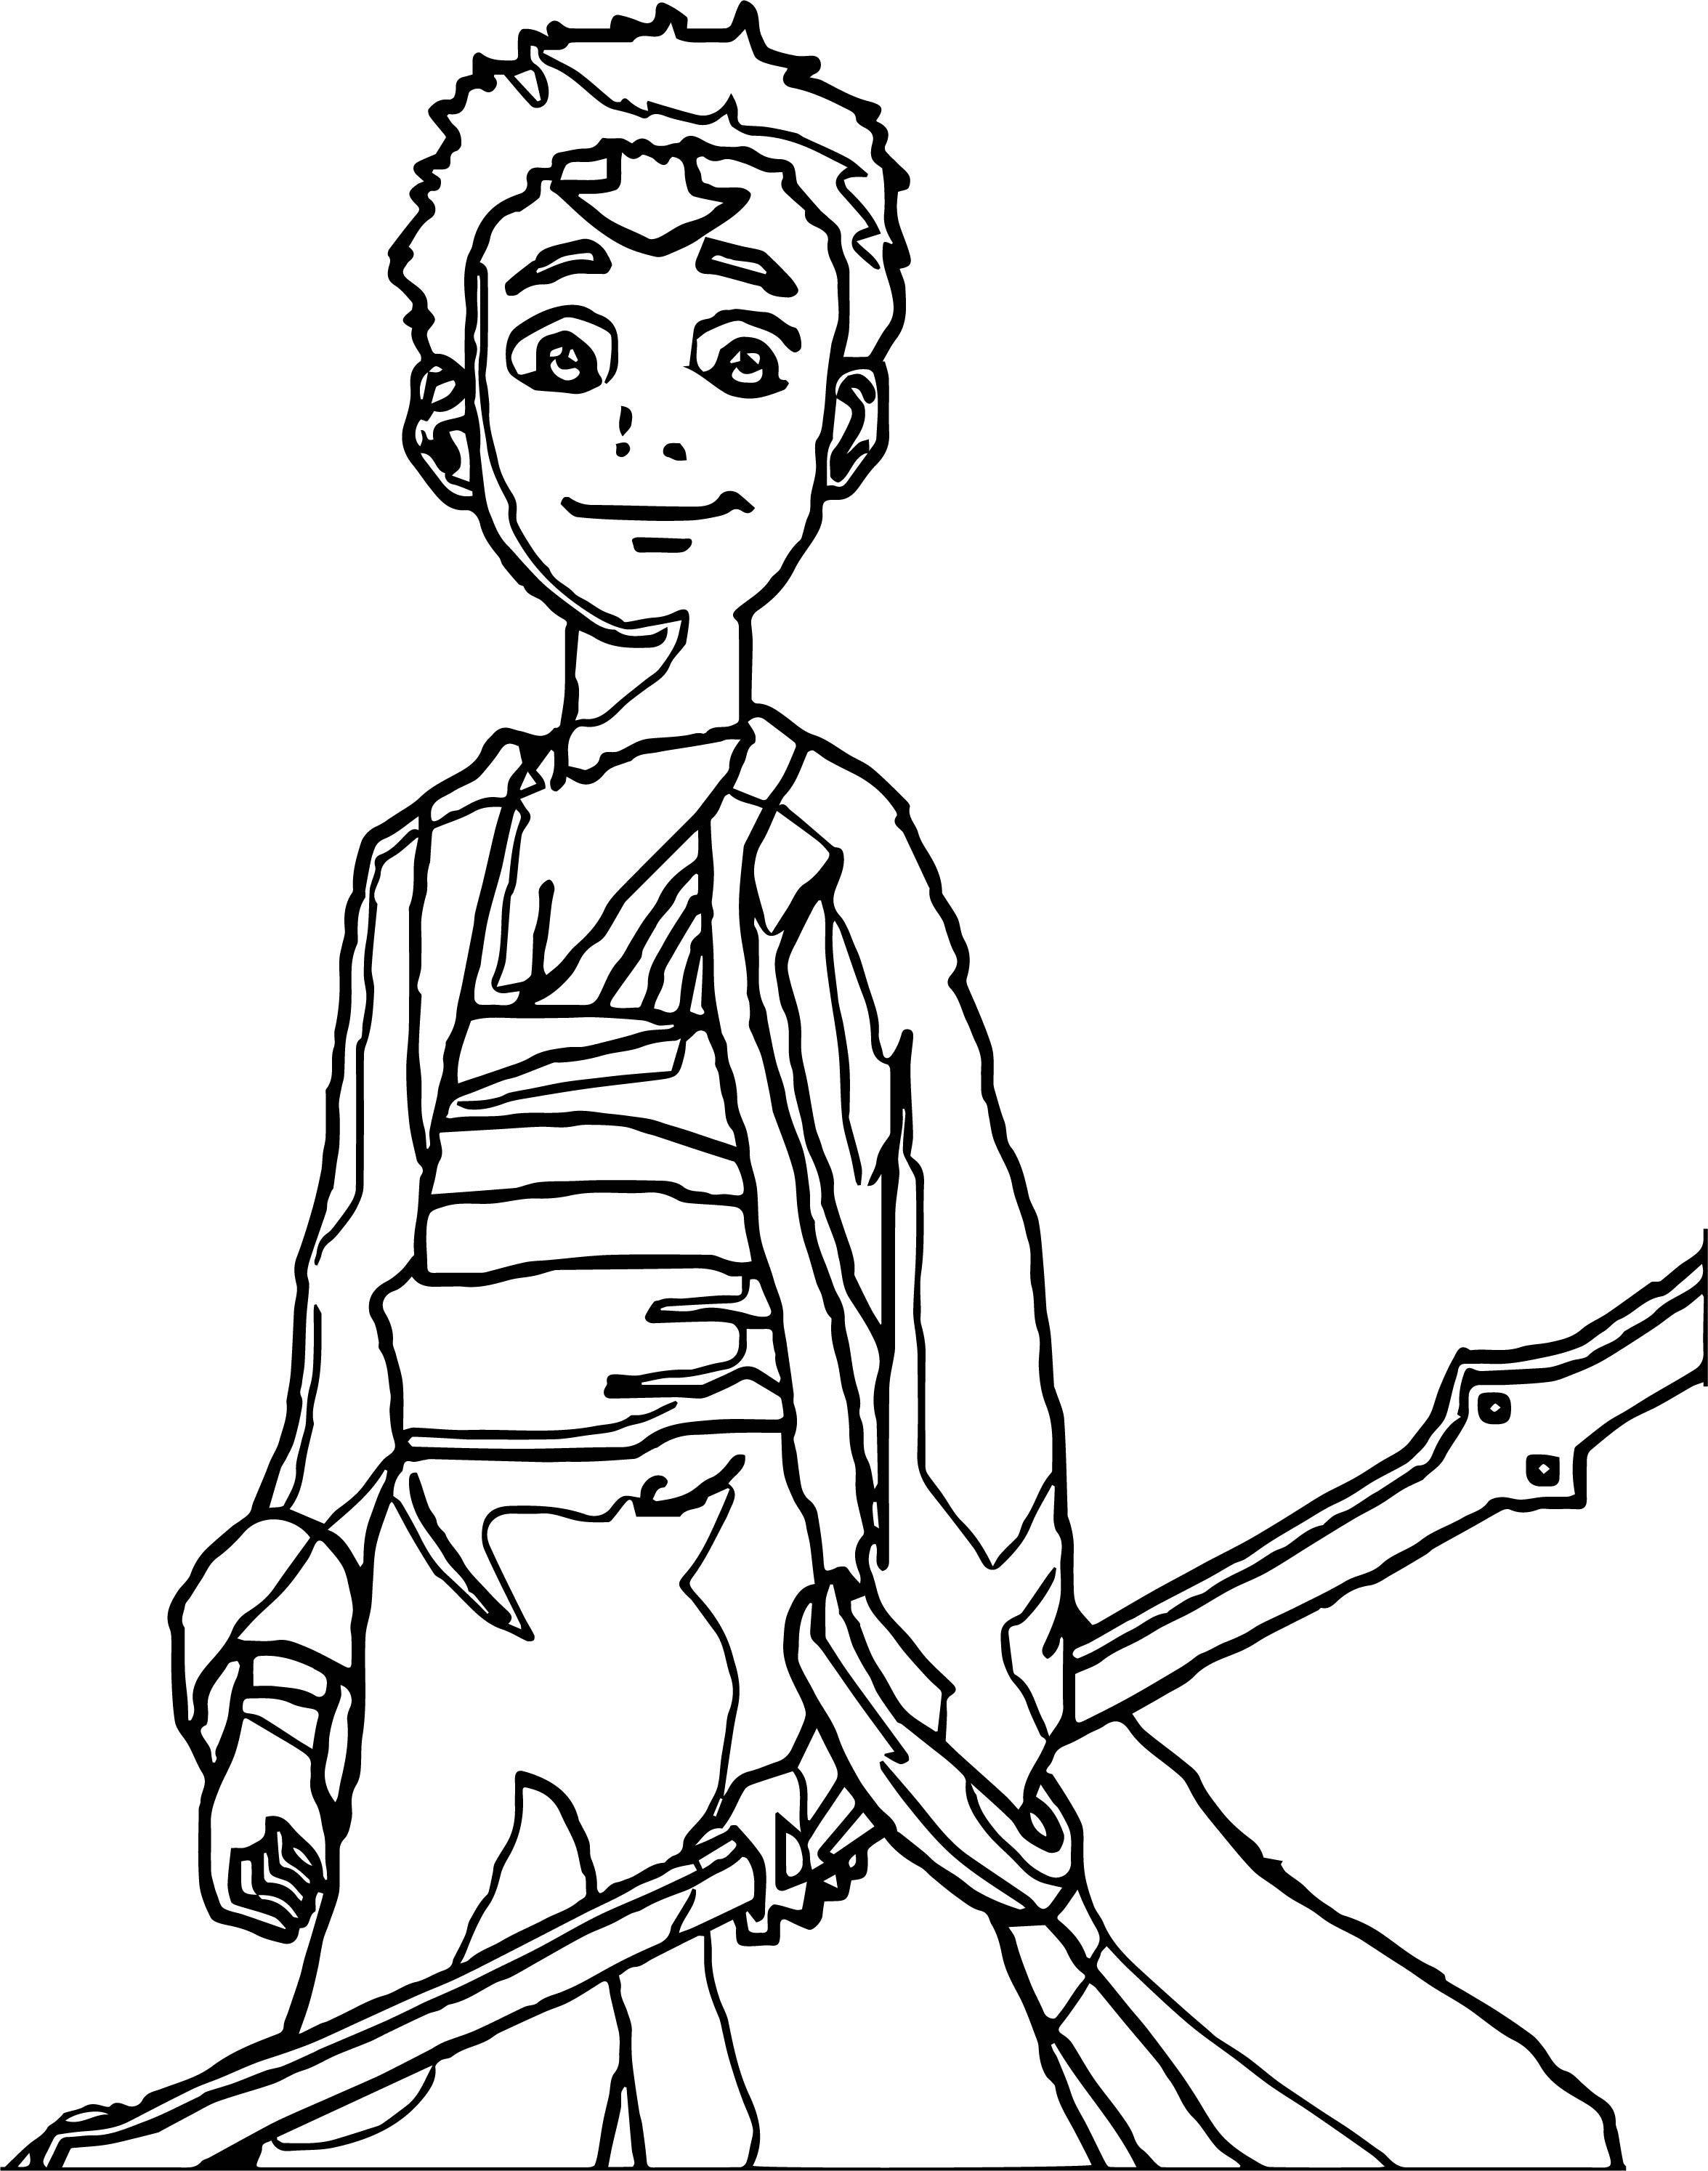 Aang avatar the last airbender recca coloring page for Avatar the last airbender coloring pages